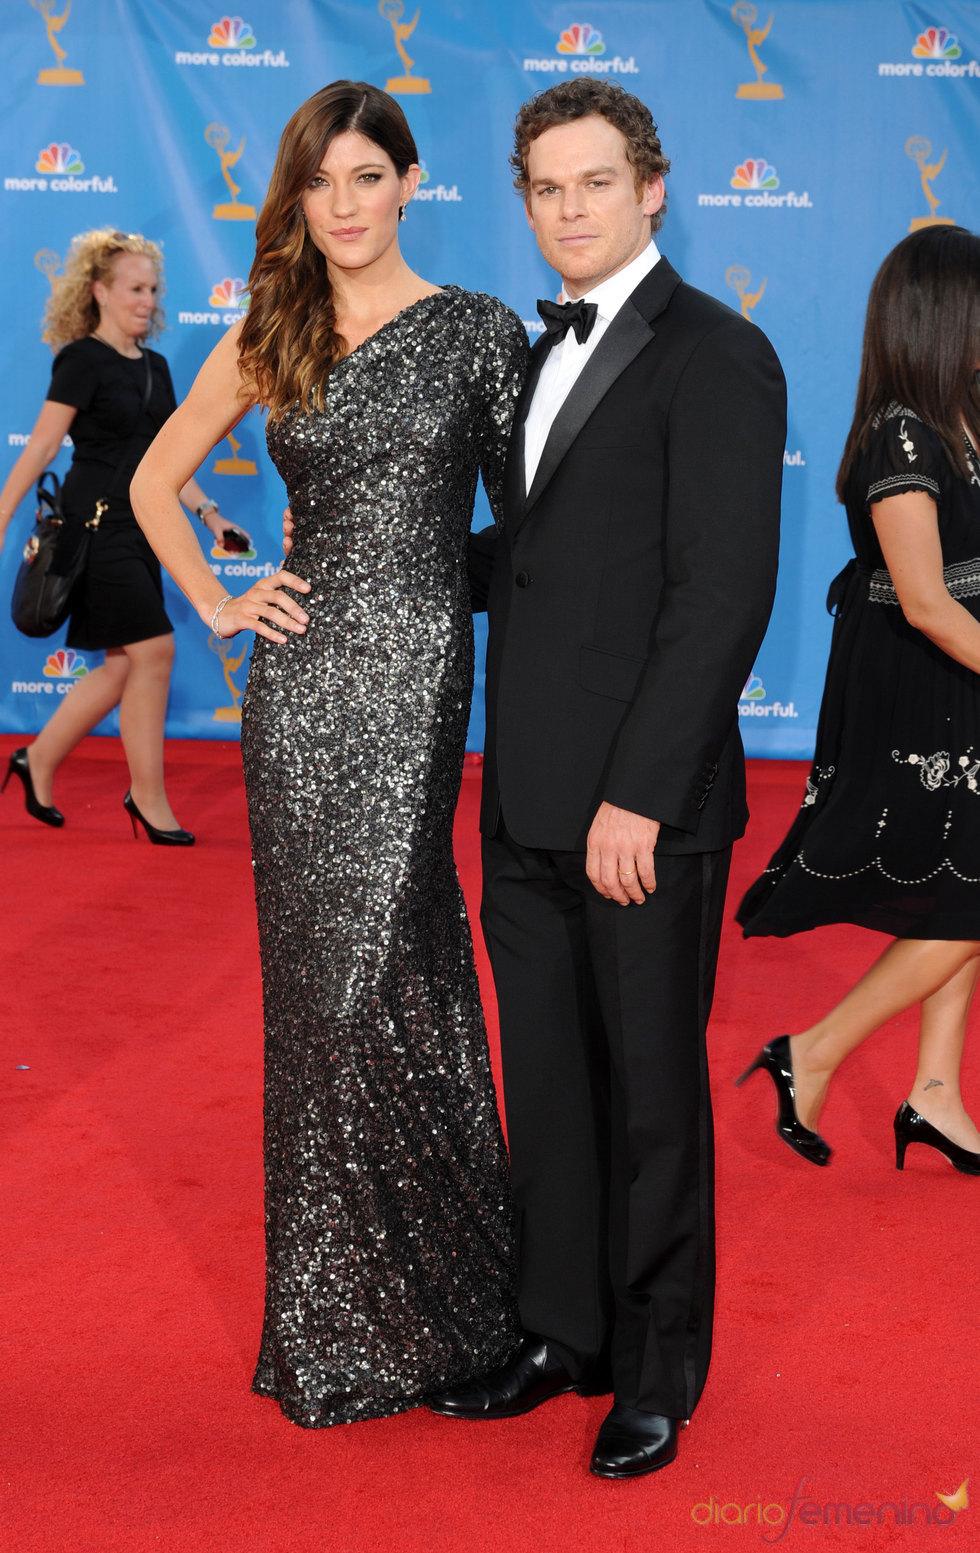 Jennifer Carpenter y Michael C. Hall en  los premios Emmy 2010